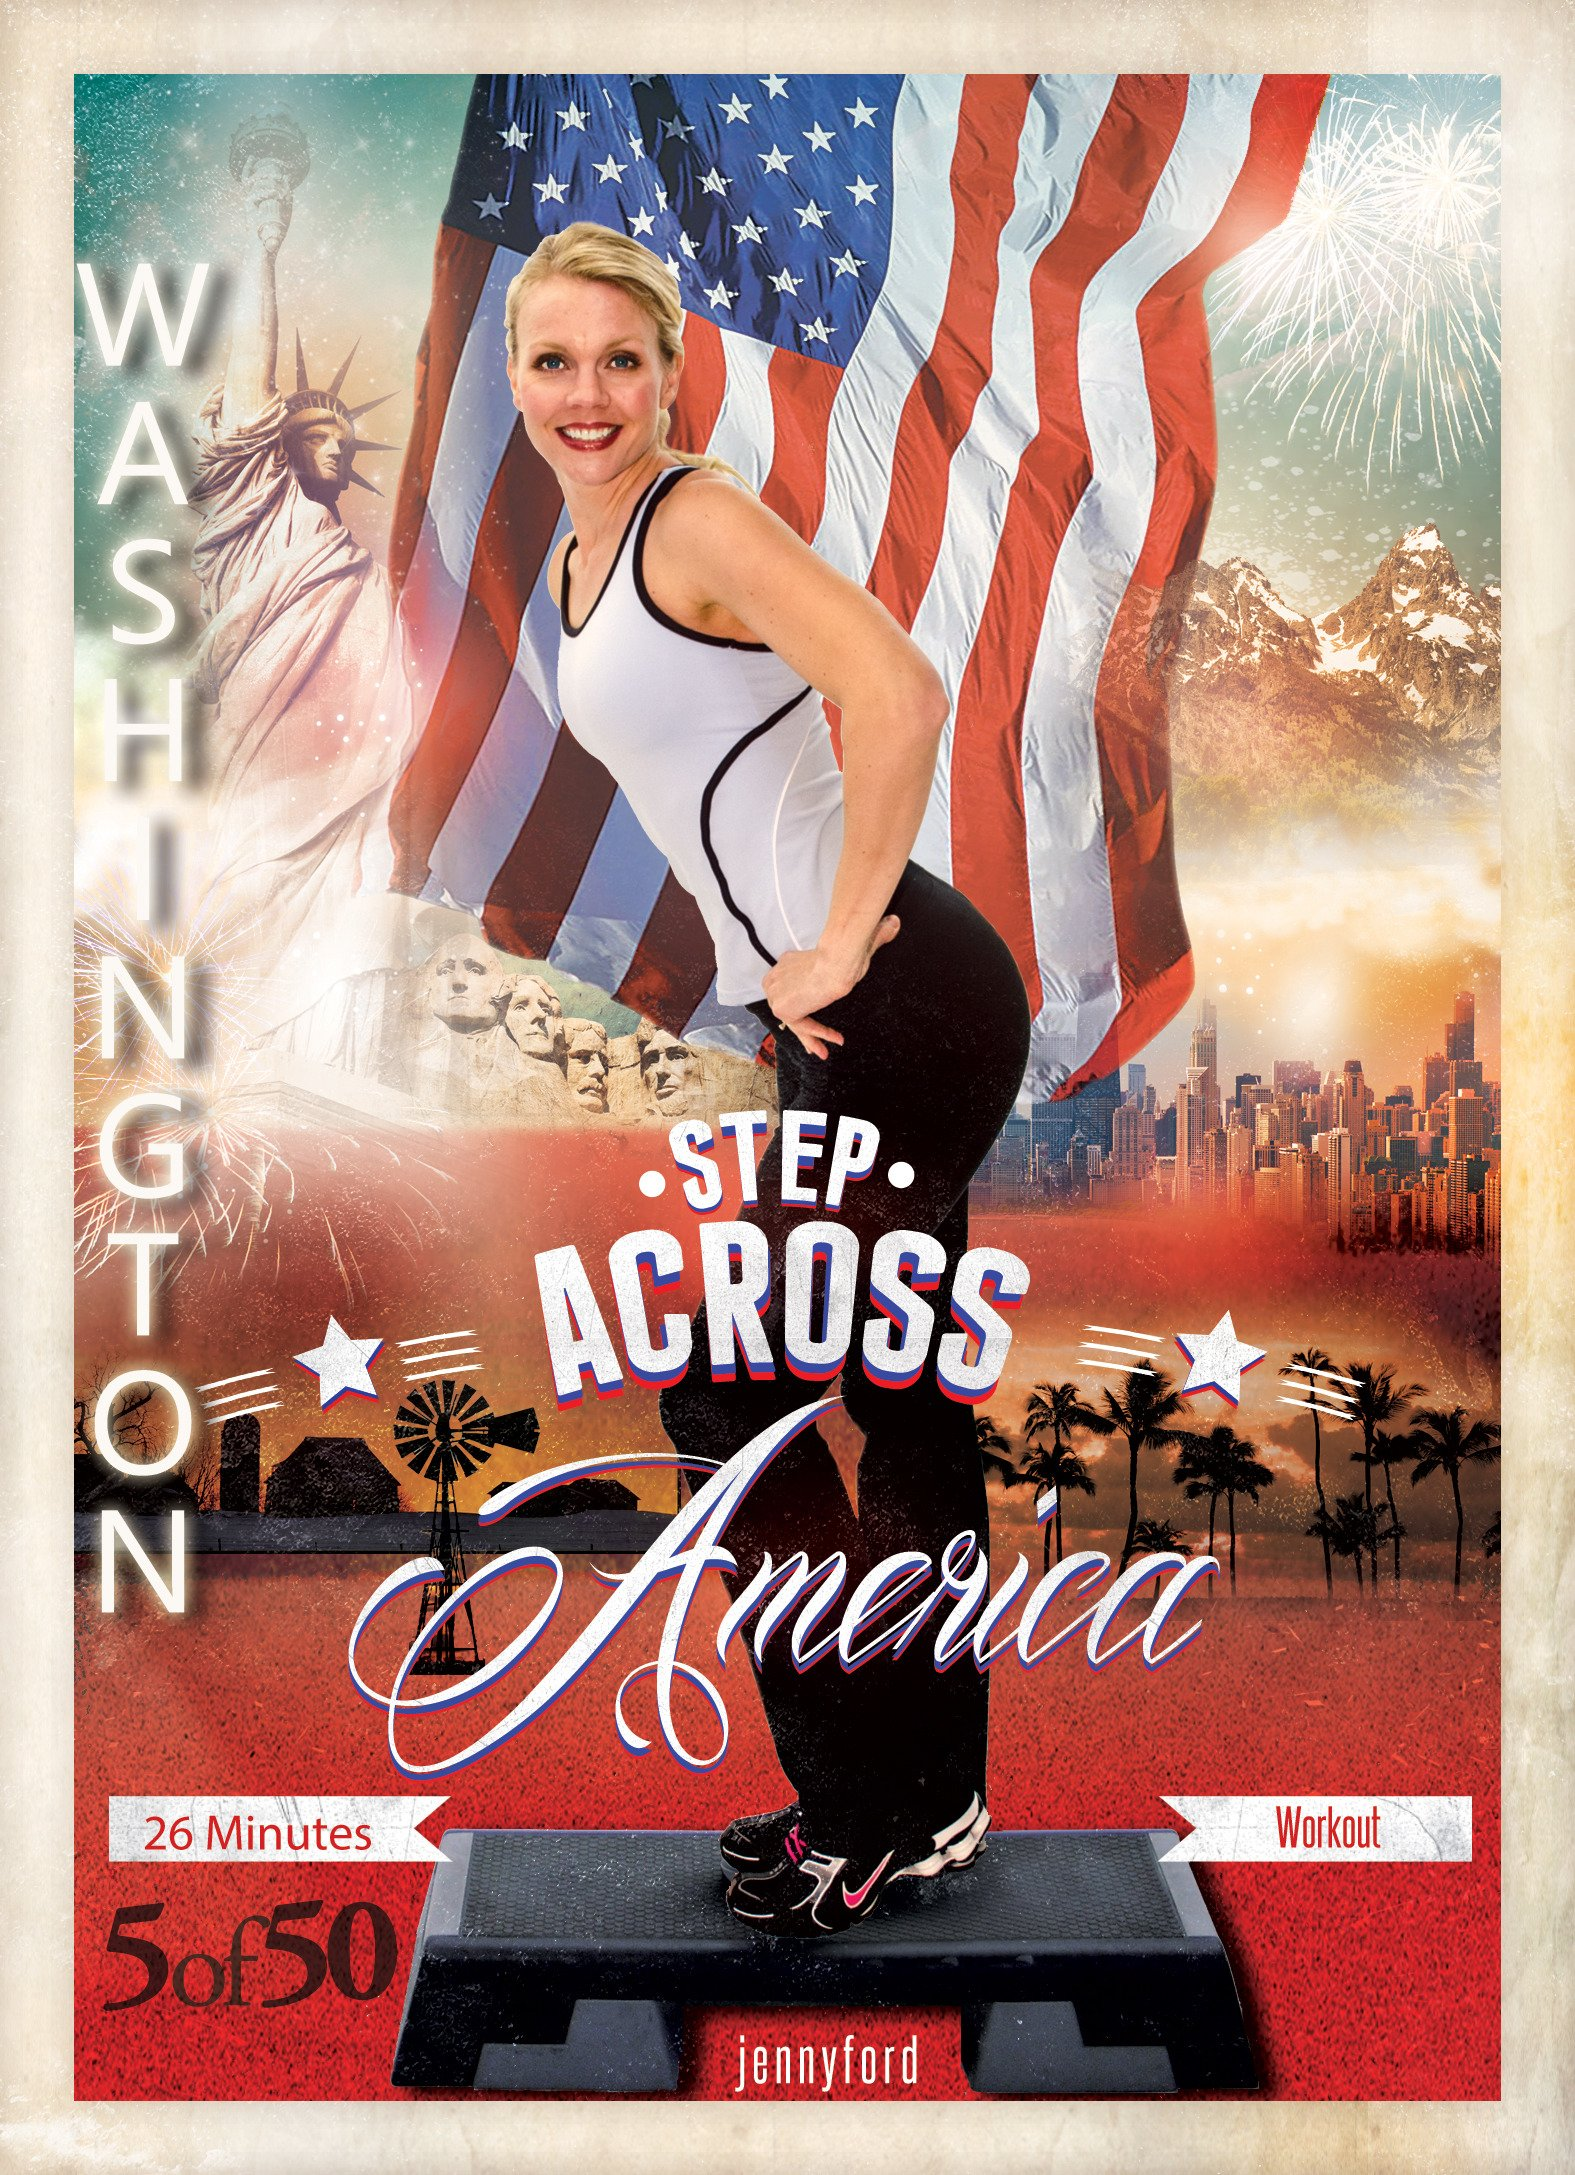 Washington Step Across America (5 of 50) Jenny Ford